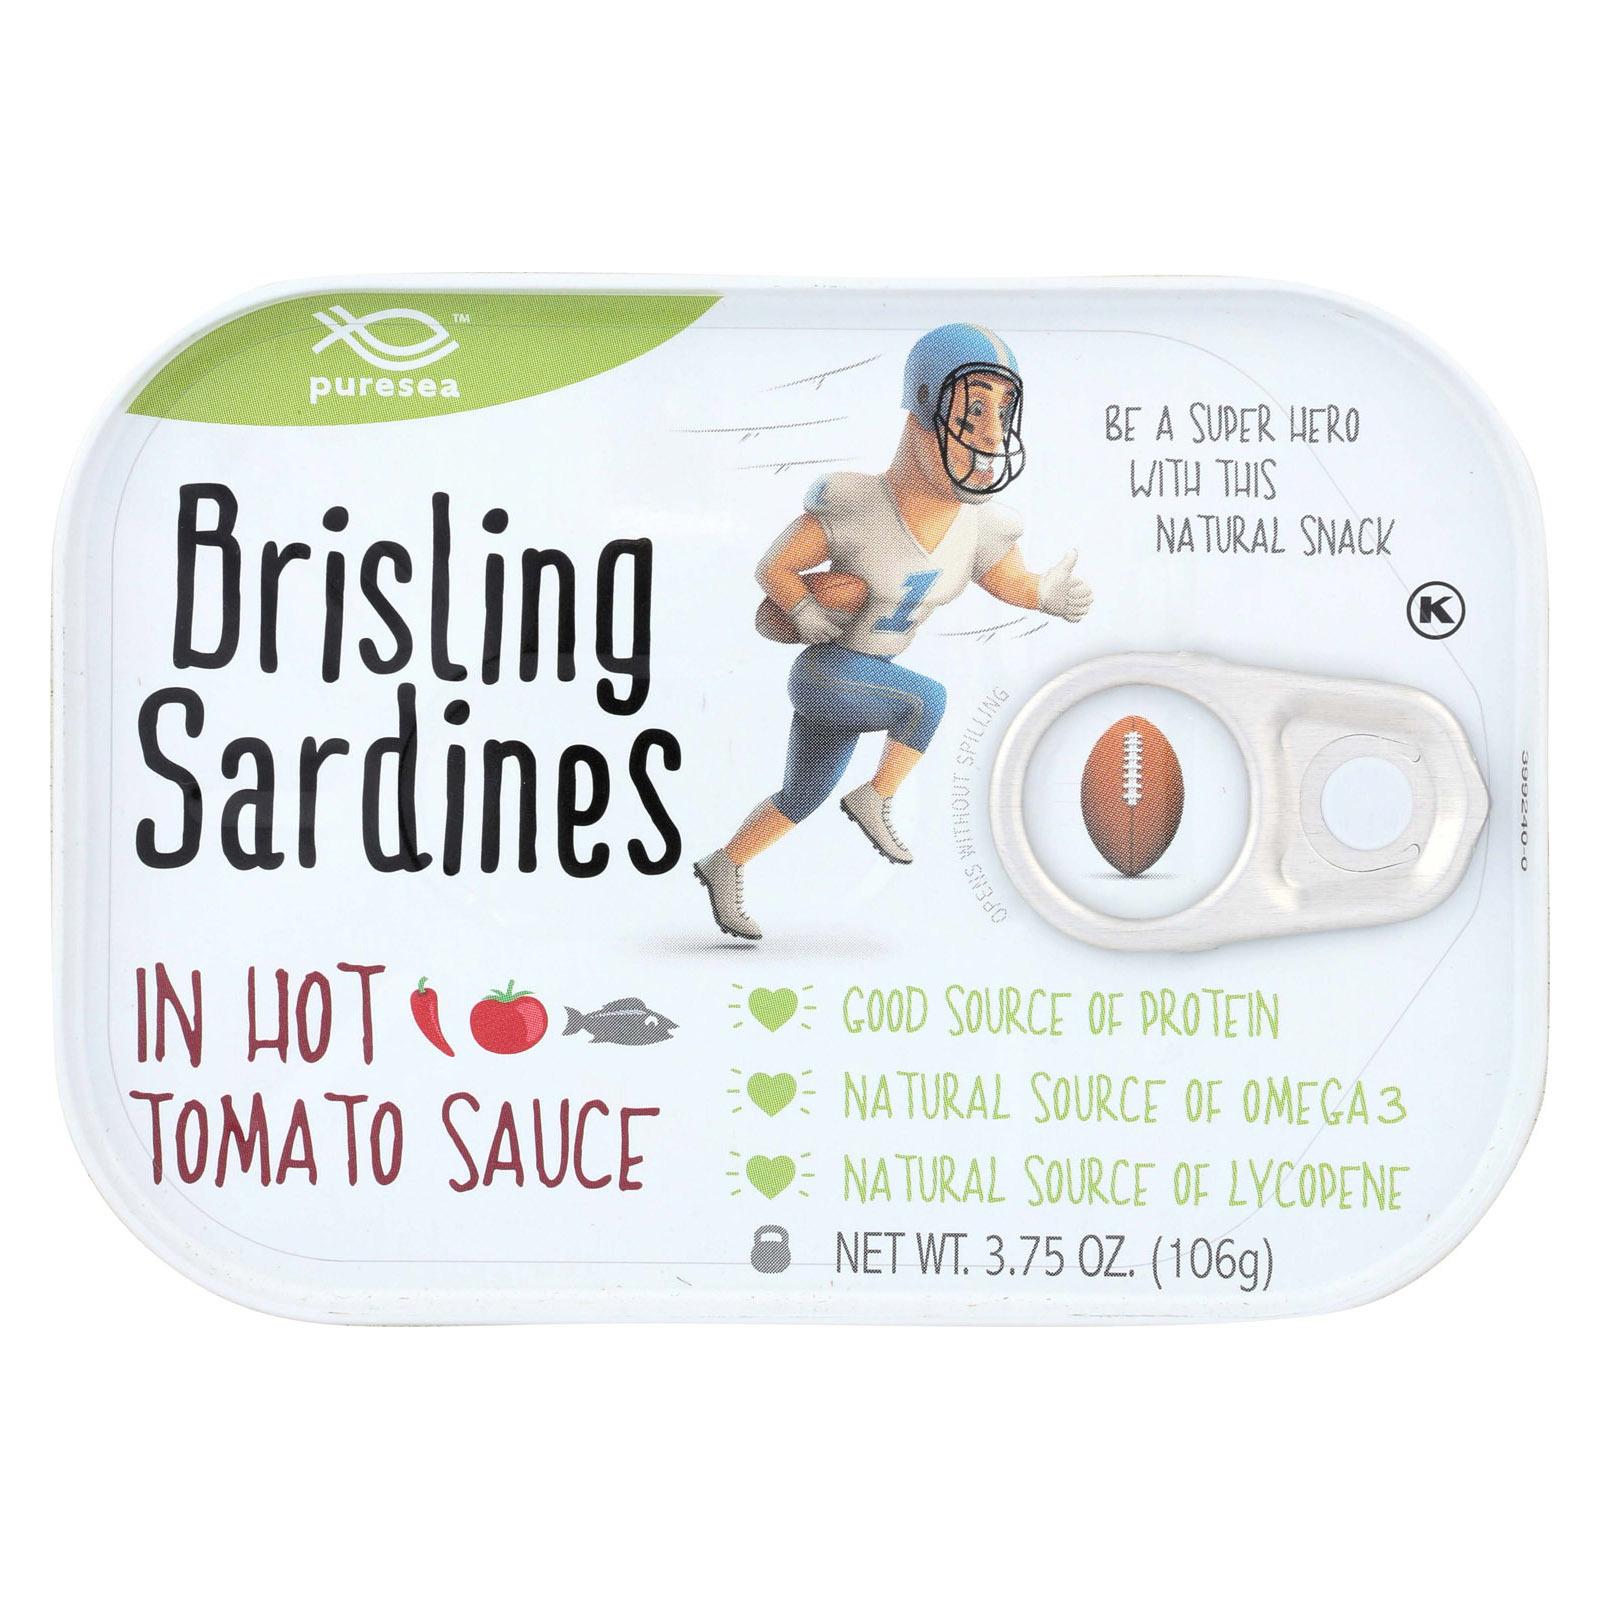 Pure Sea Sardines - Brisling - Hot Tom - Case of 12 - 3.75 oz